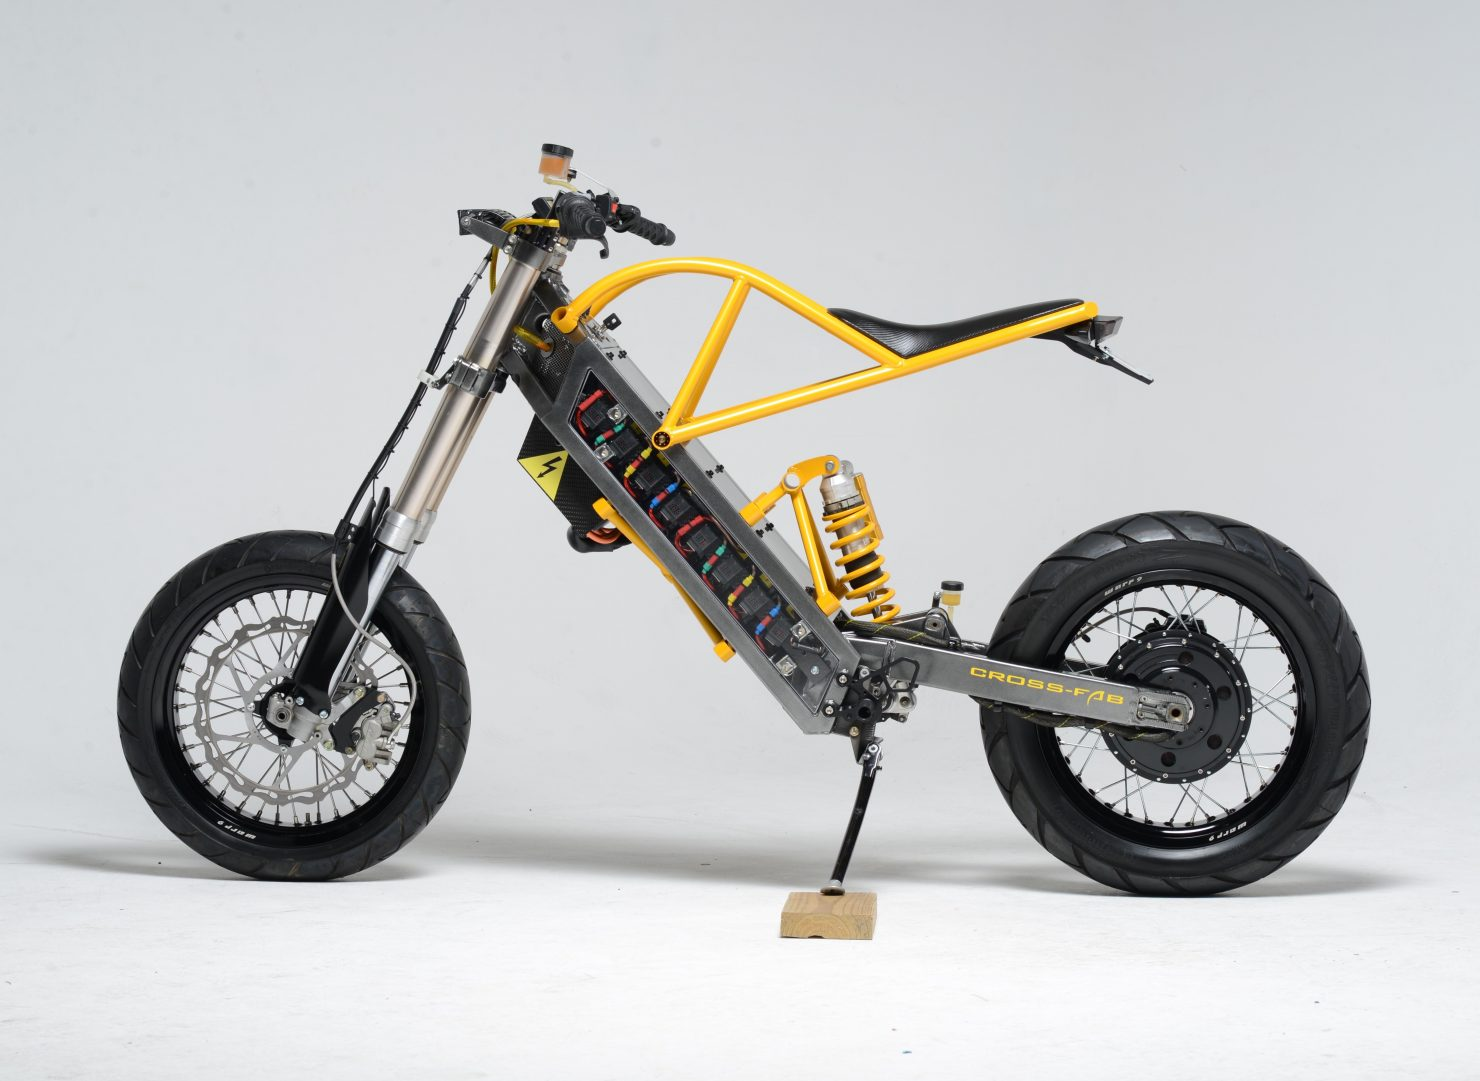 ExoDyne Electric Motorcycle 1480x1081 - ExoDyne Electric Motorcycle